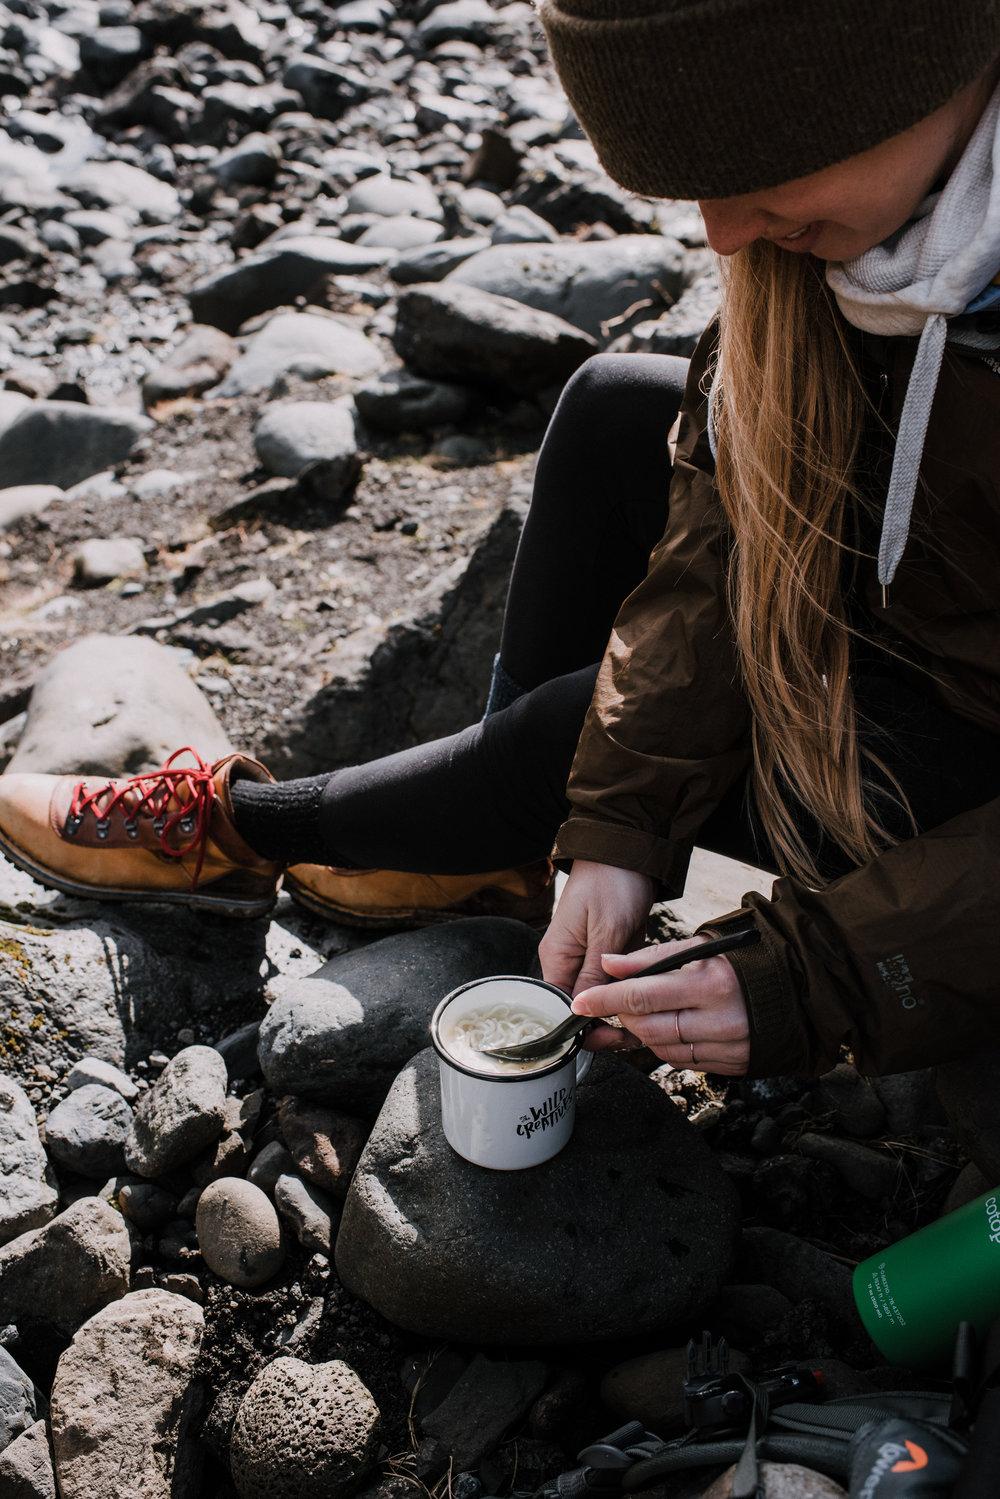 ICELAND_WOMAN_PHOTOGRAPHER_TARASHUPE_OUTDOOR_PHOTOGRAPHY_023.jpg